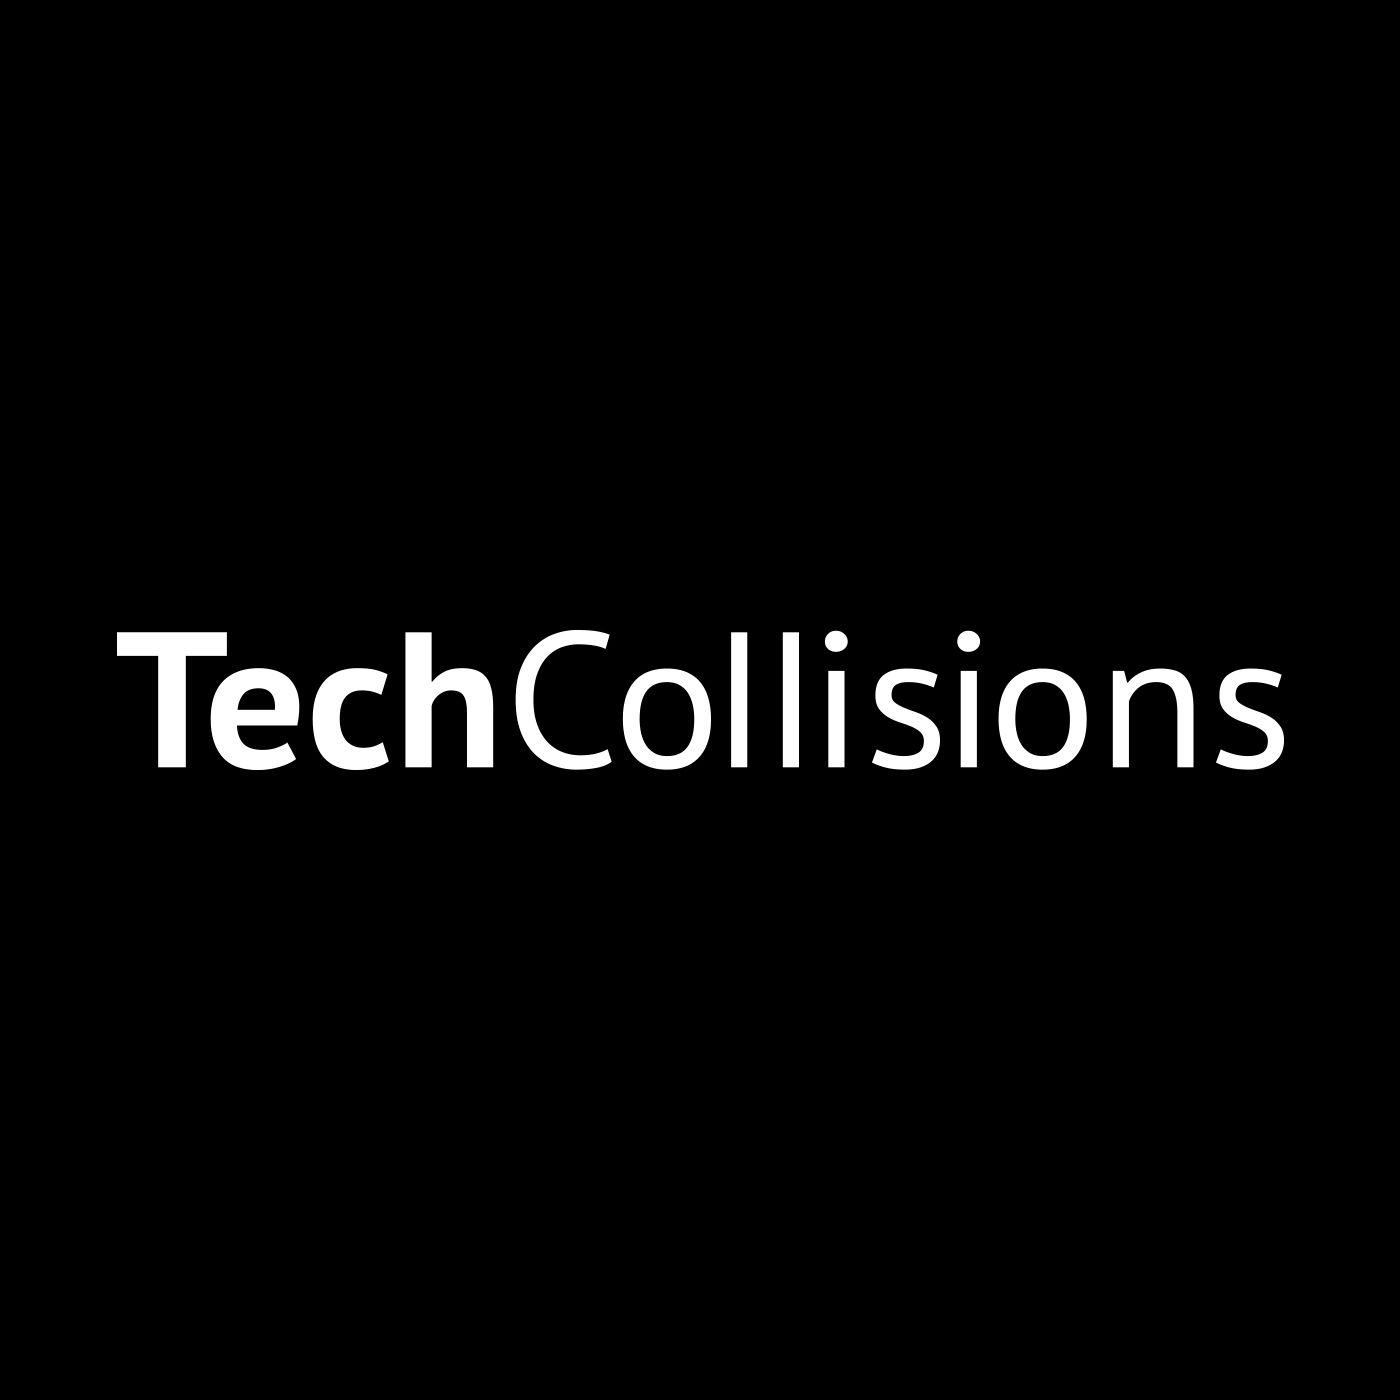 TechCollisions